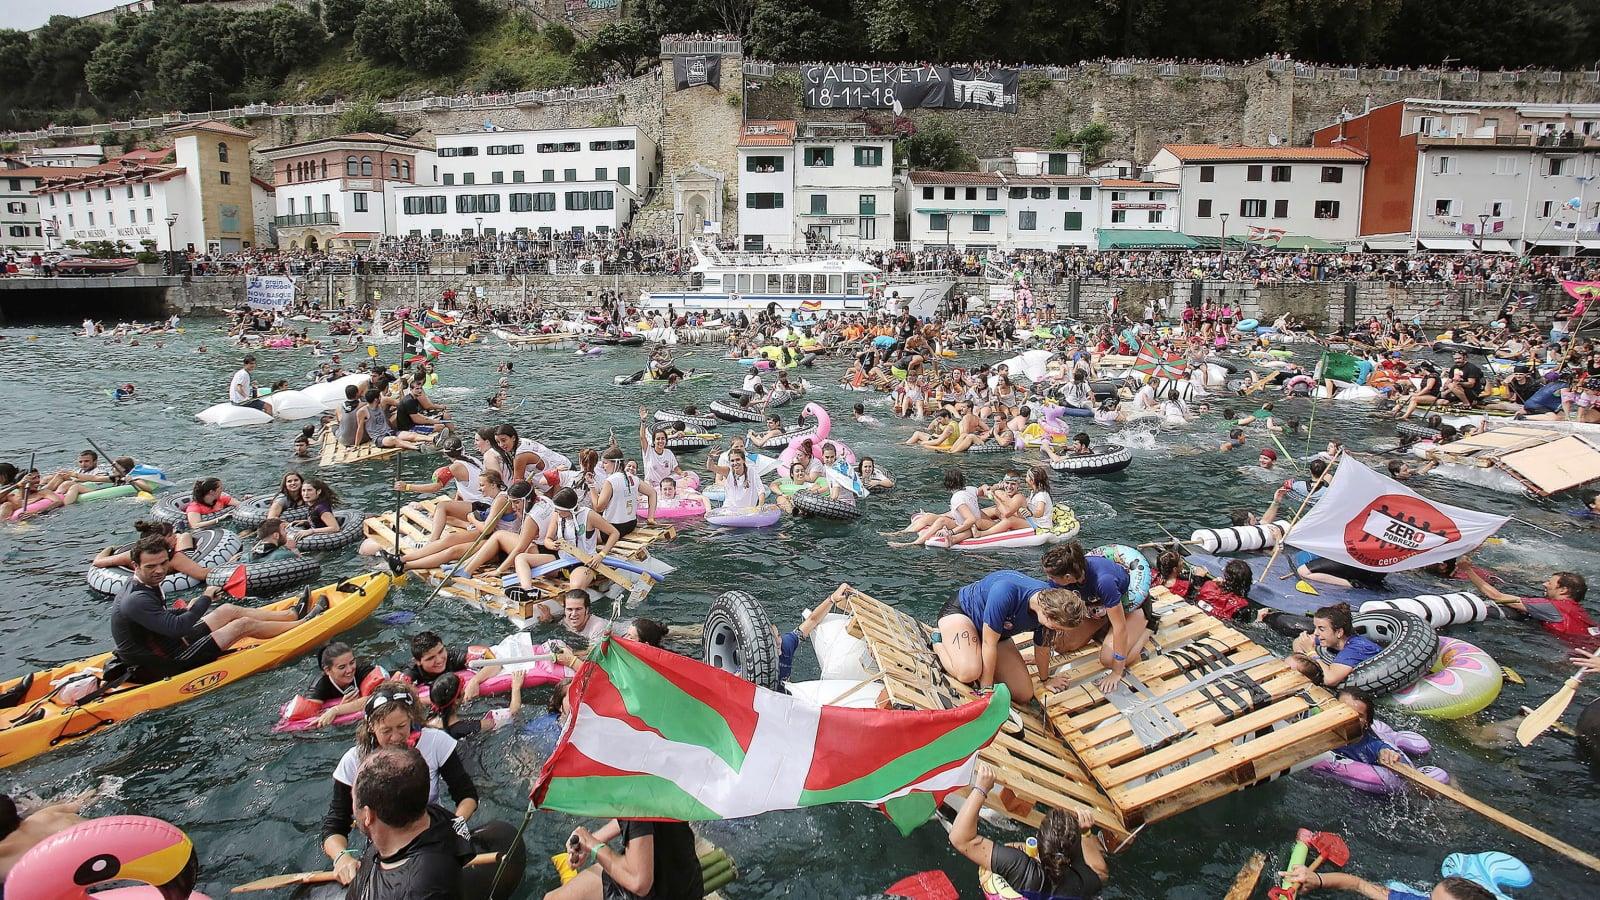 Pirate Boarding w Hiszpanii fot. EPA/Gorka Estrada